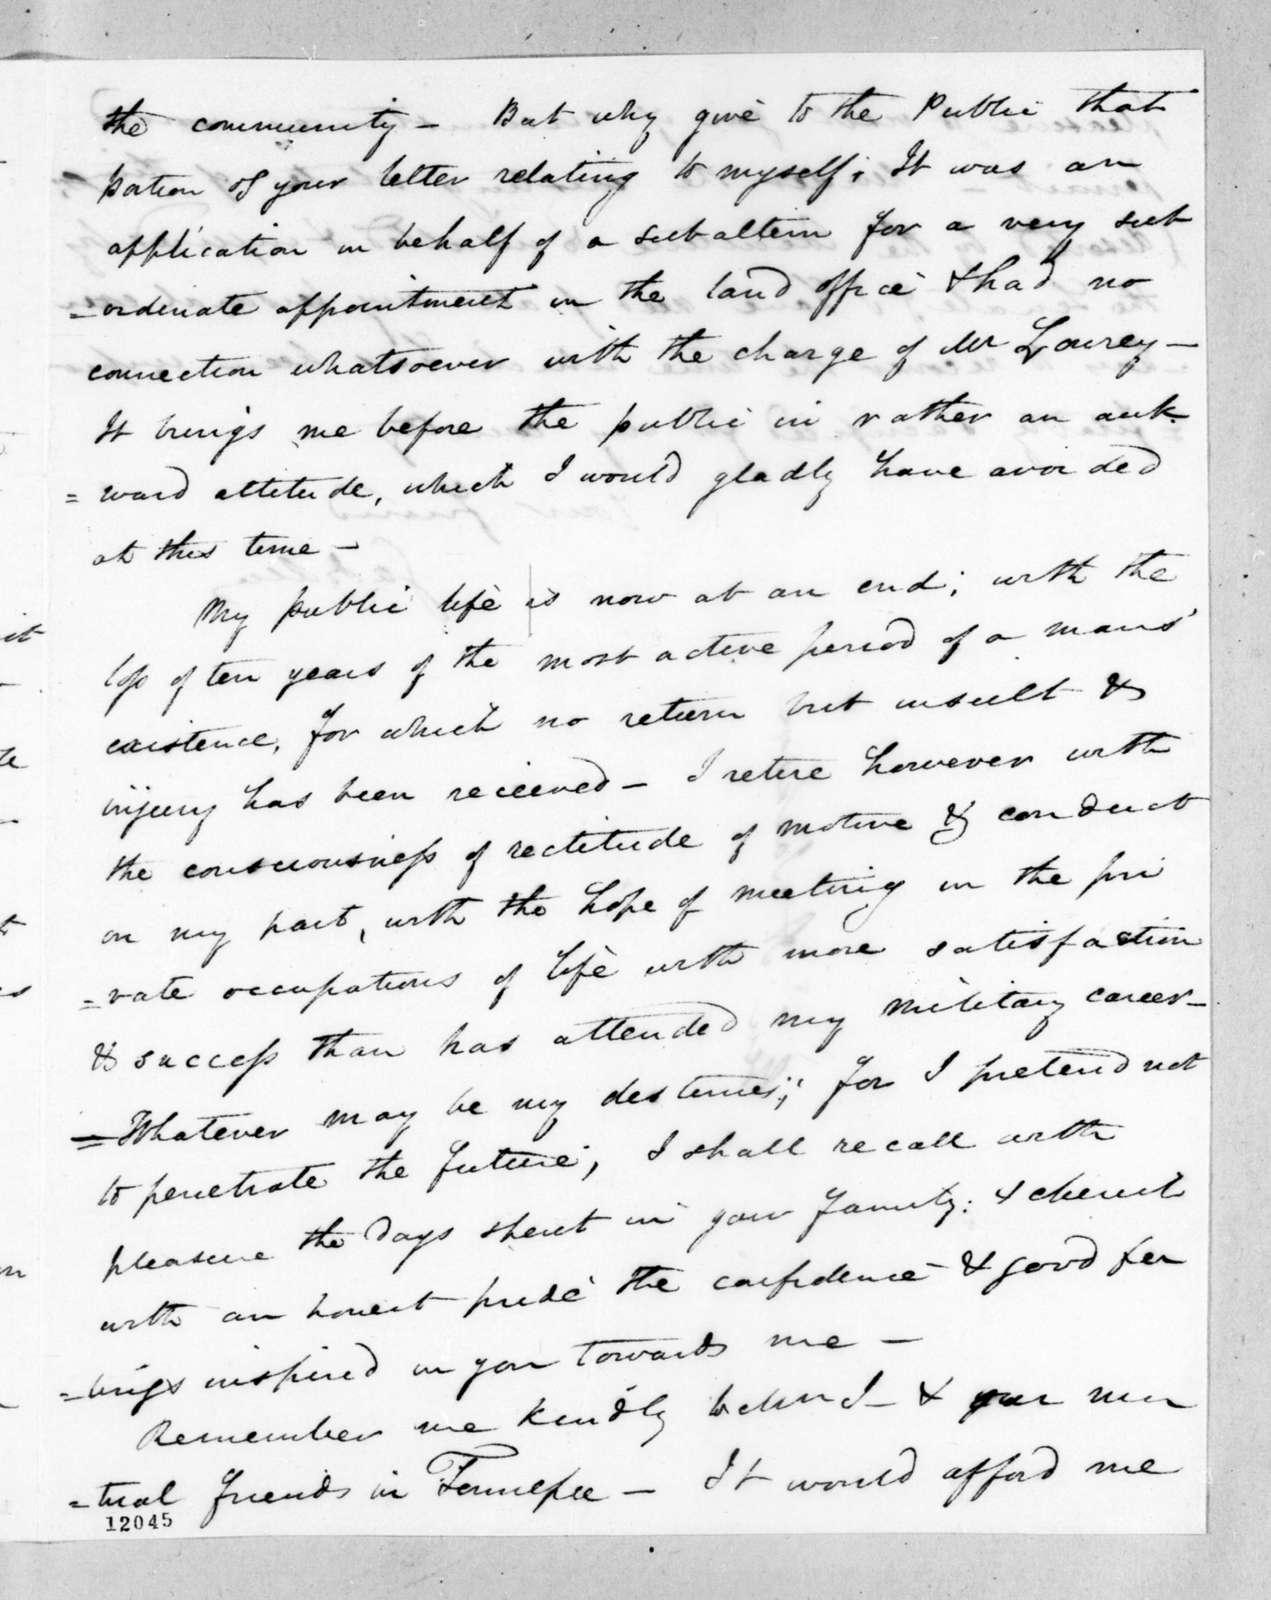 James Gadsden to Andrew Jackson, May 26, 1824